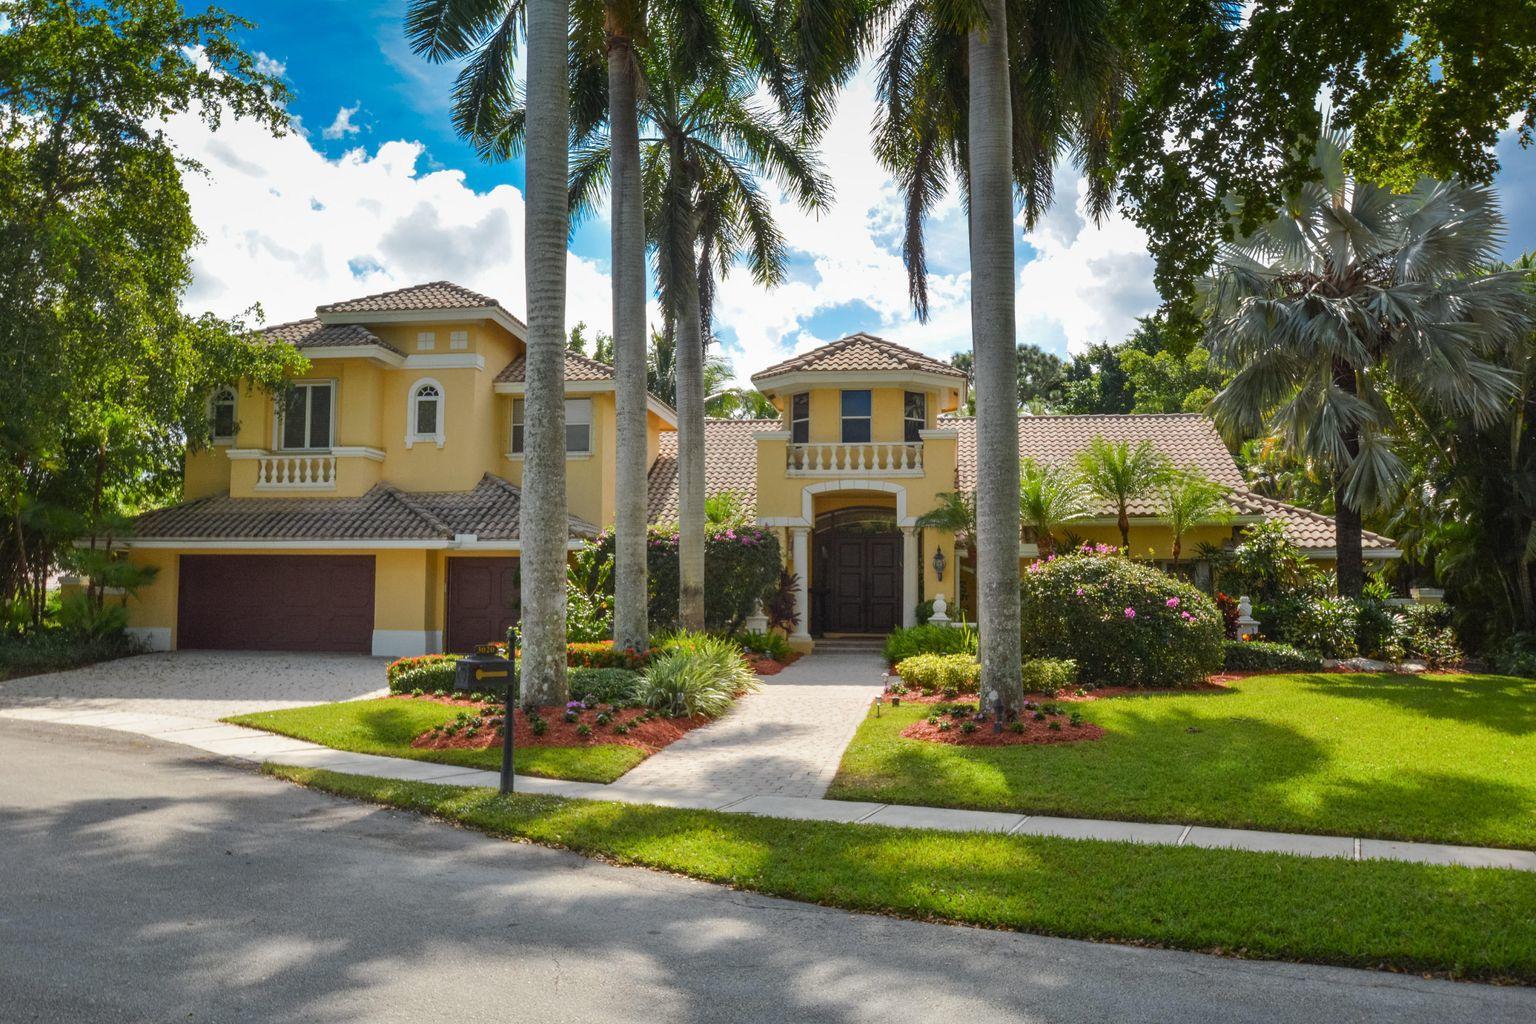 Photo of 3020 Andrews Place, Boca Raton, FL 33434